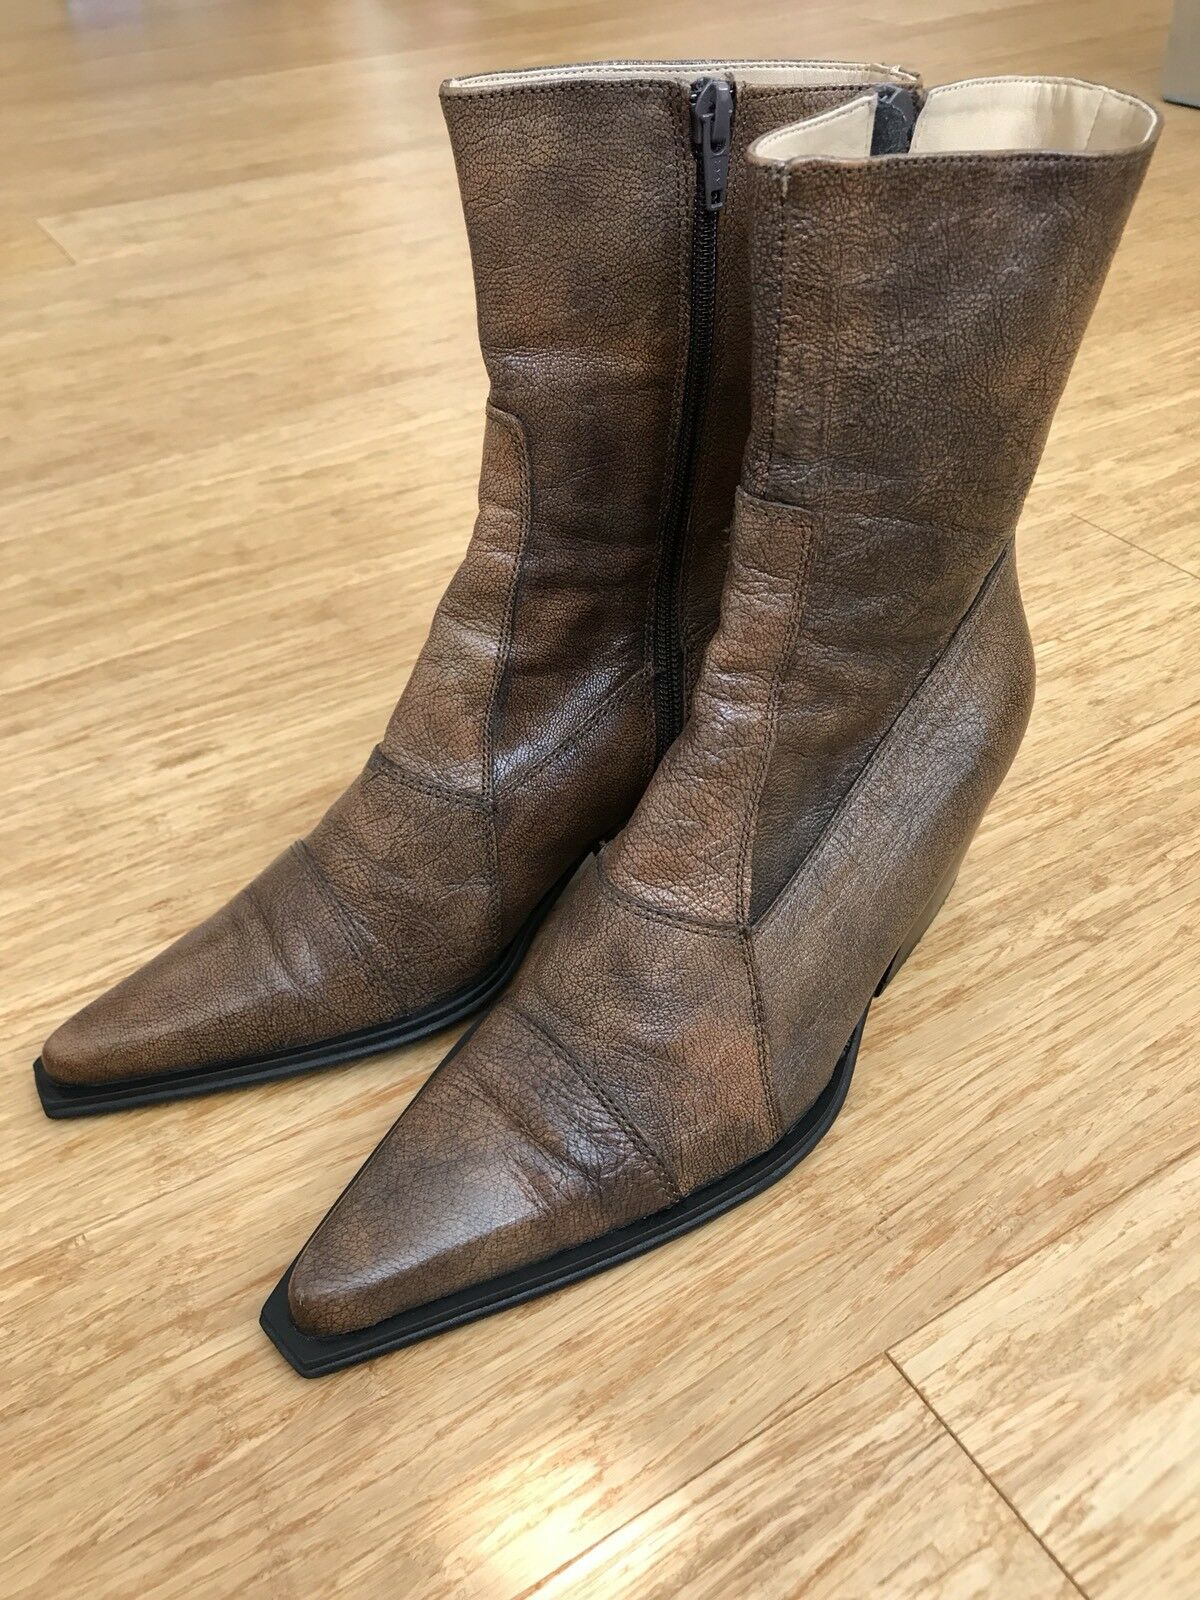 Coole Westernstiefel Cowboystiefel Boots Stiefelette Leder Echtleder 39